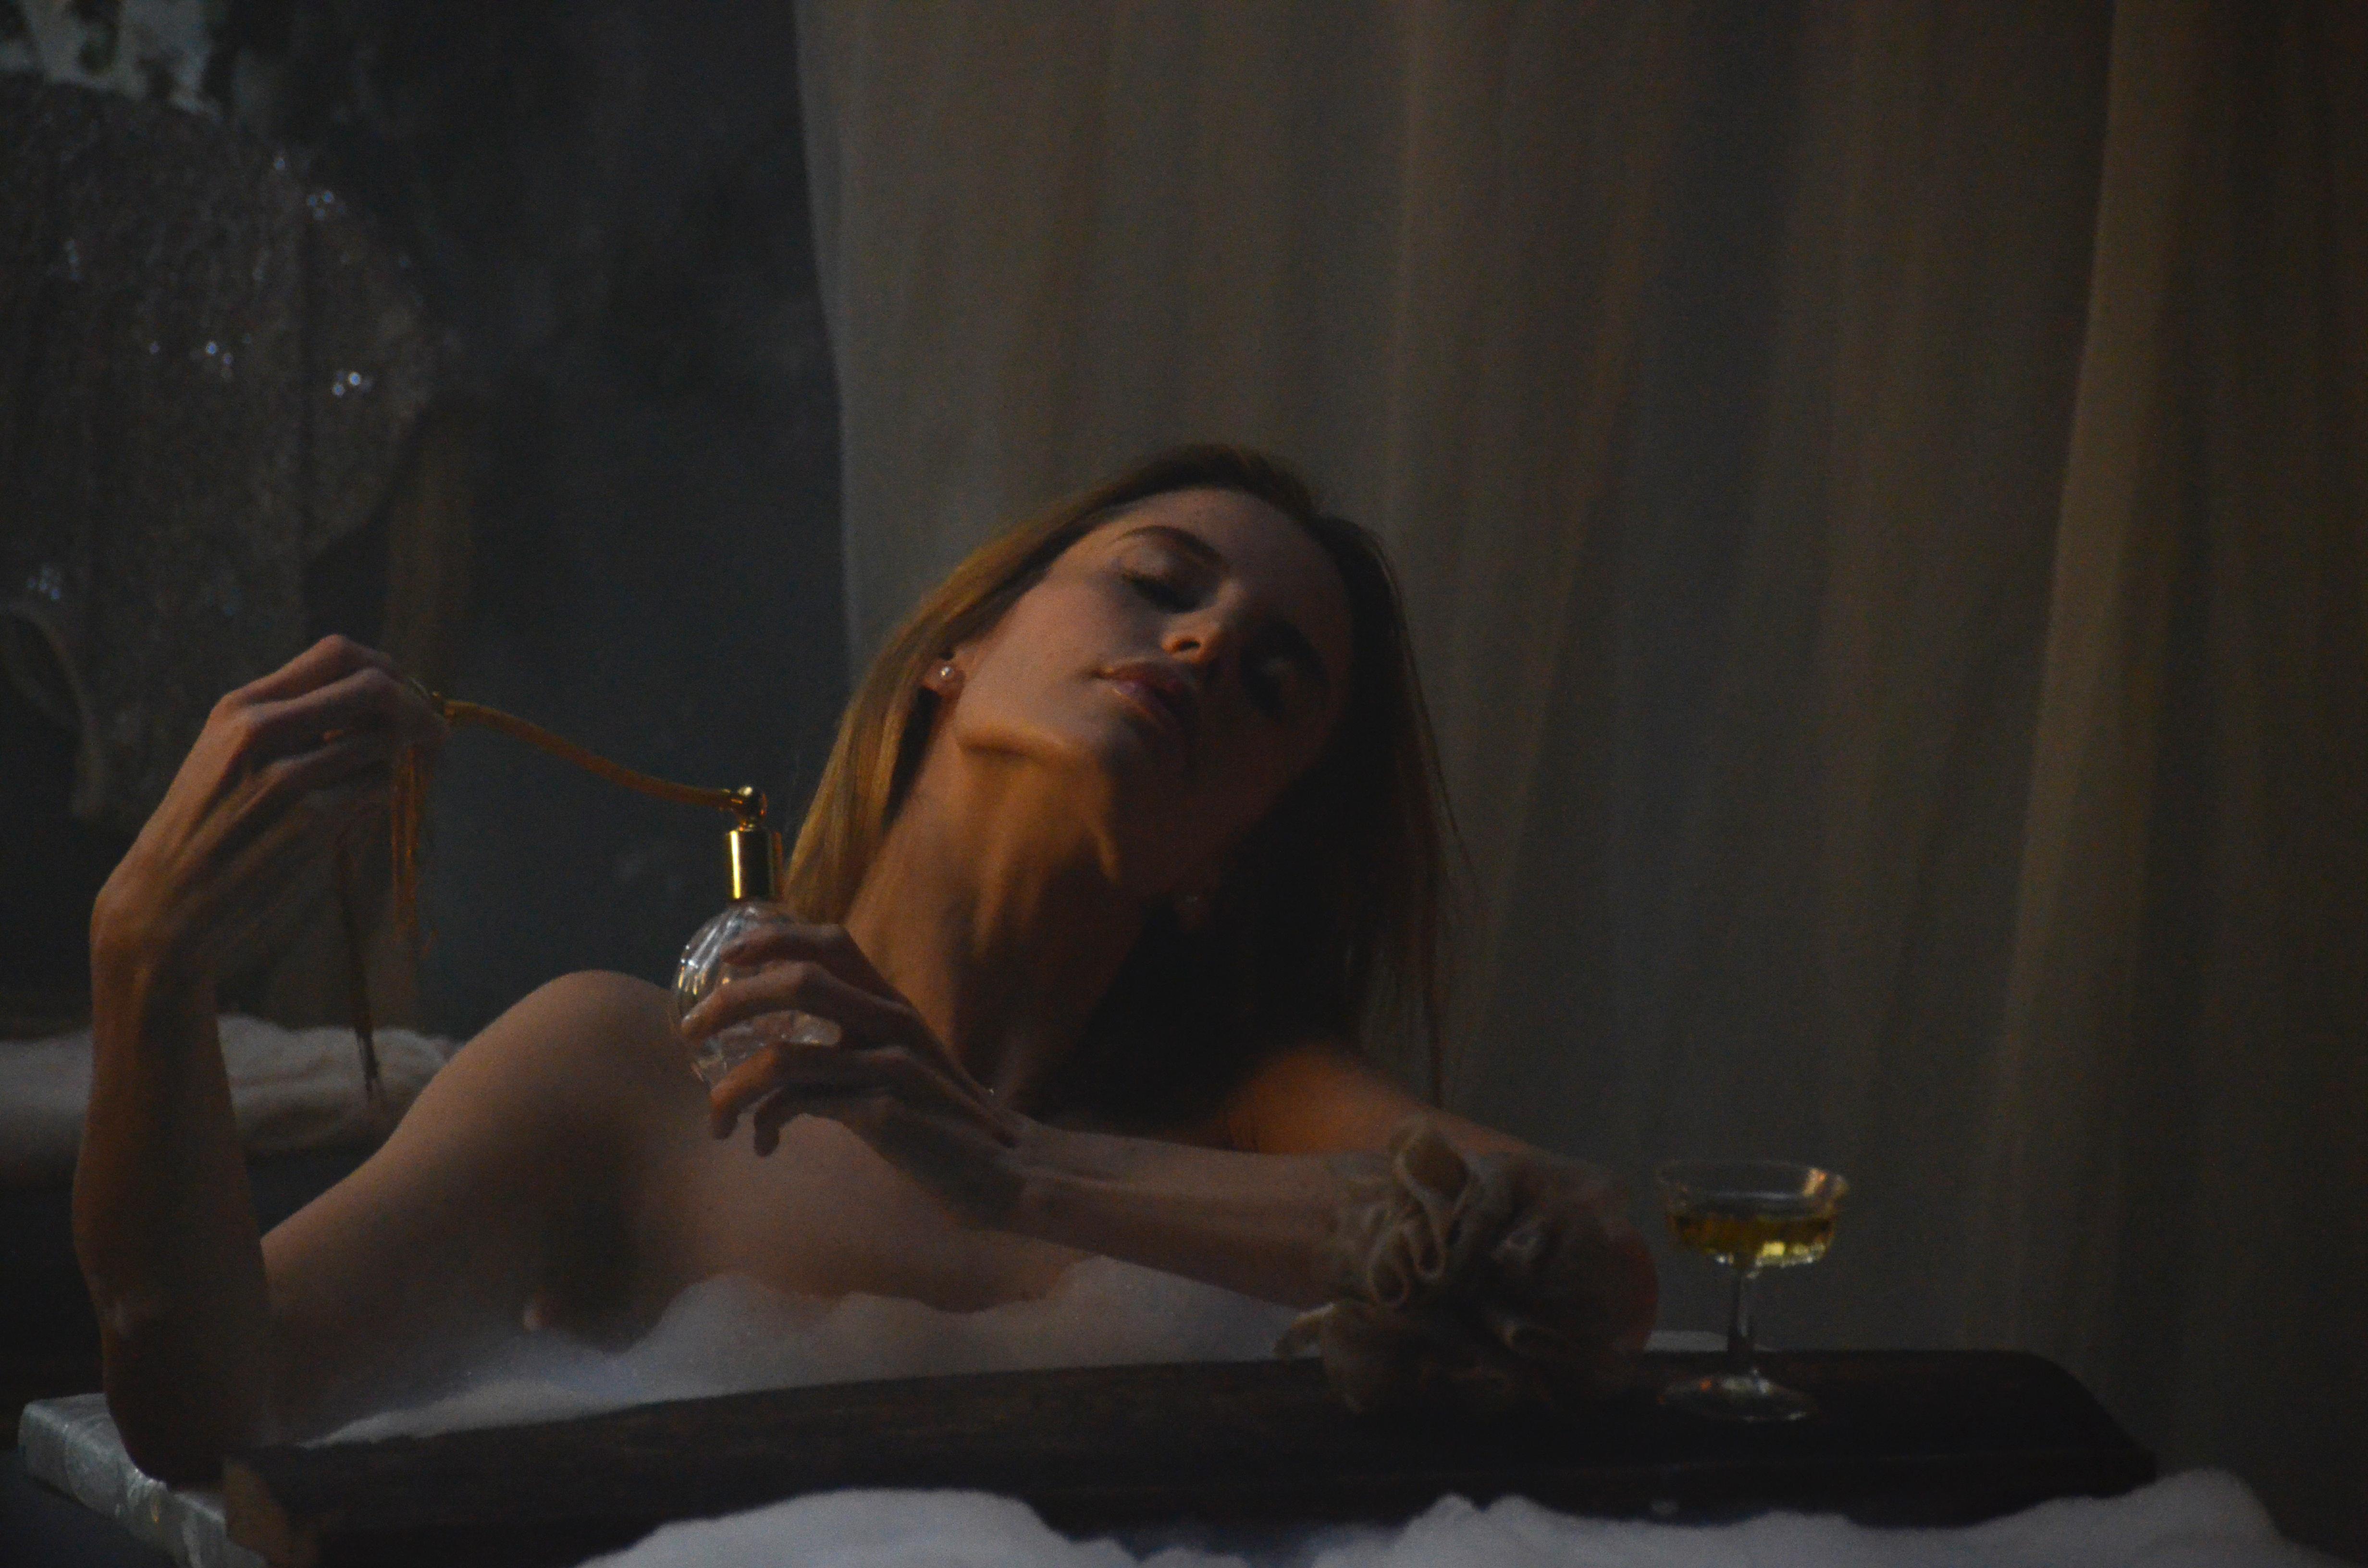 Devils Fragrance-Perfume Commercial